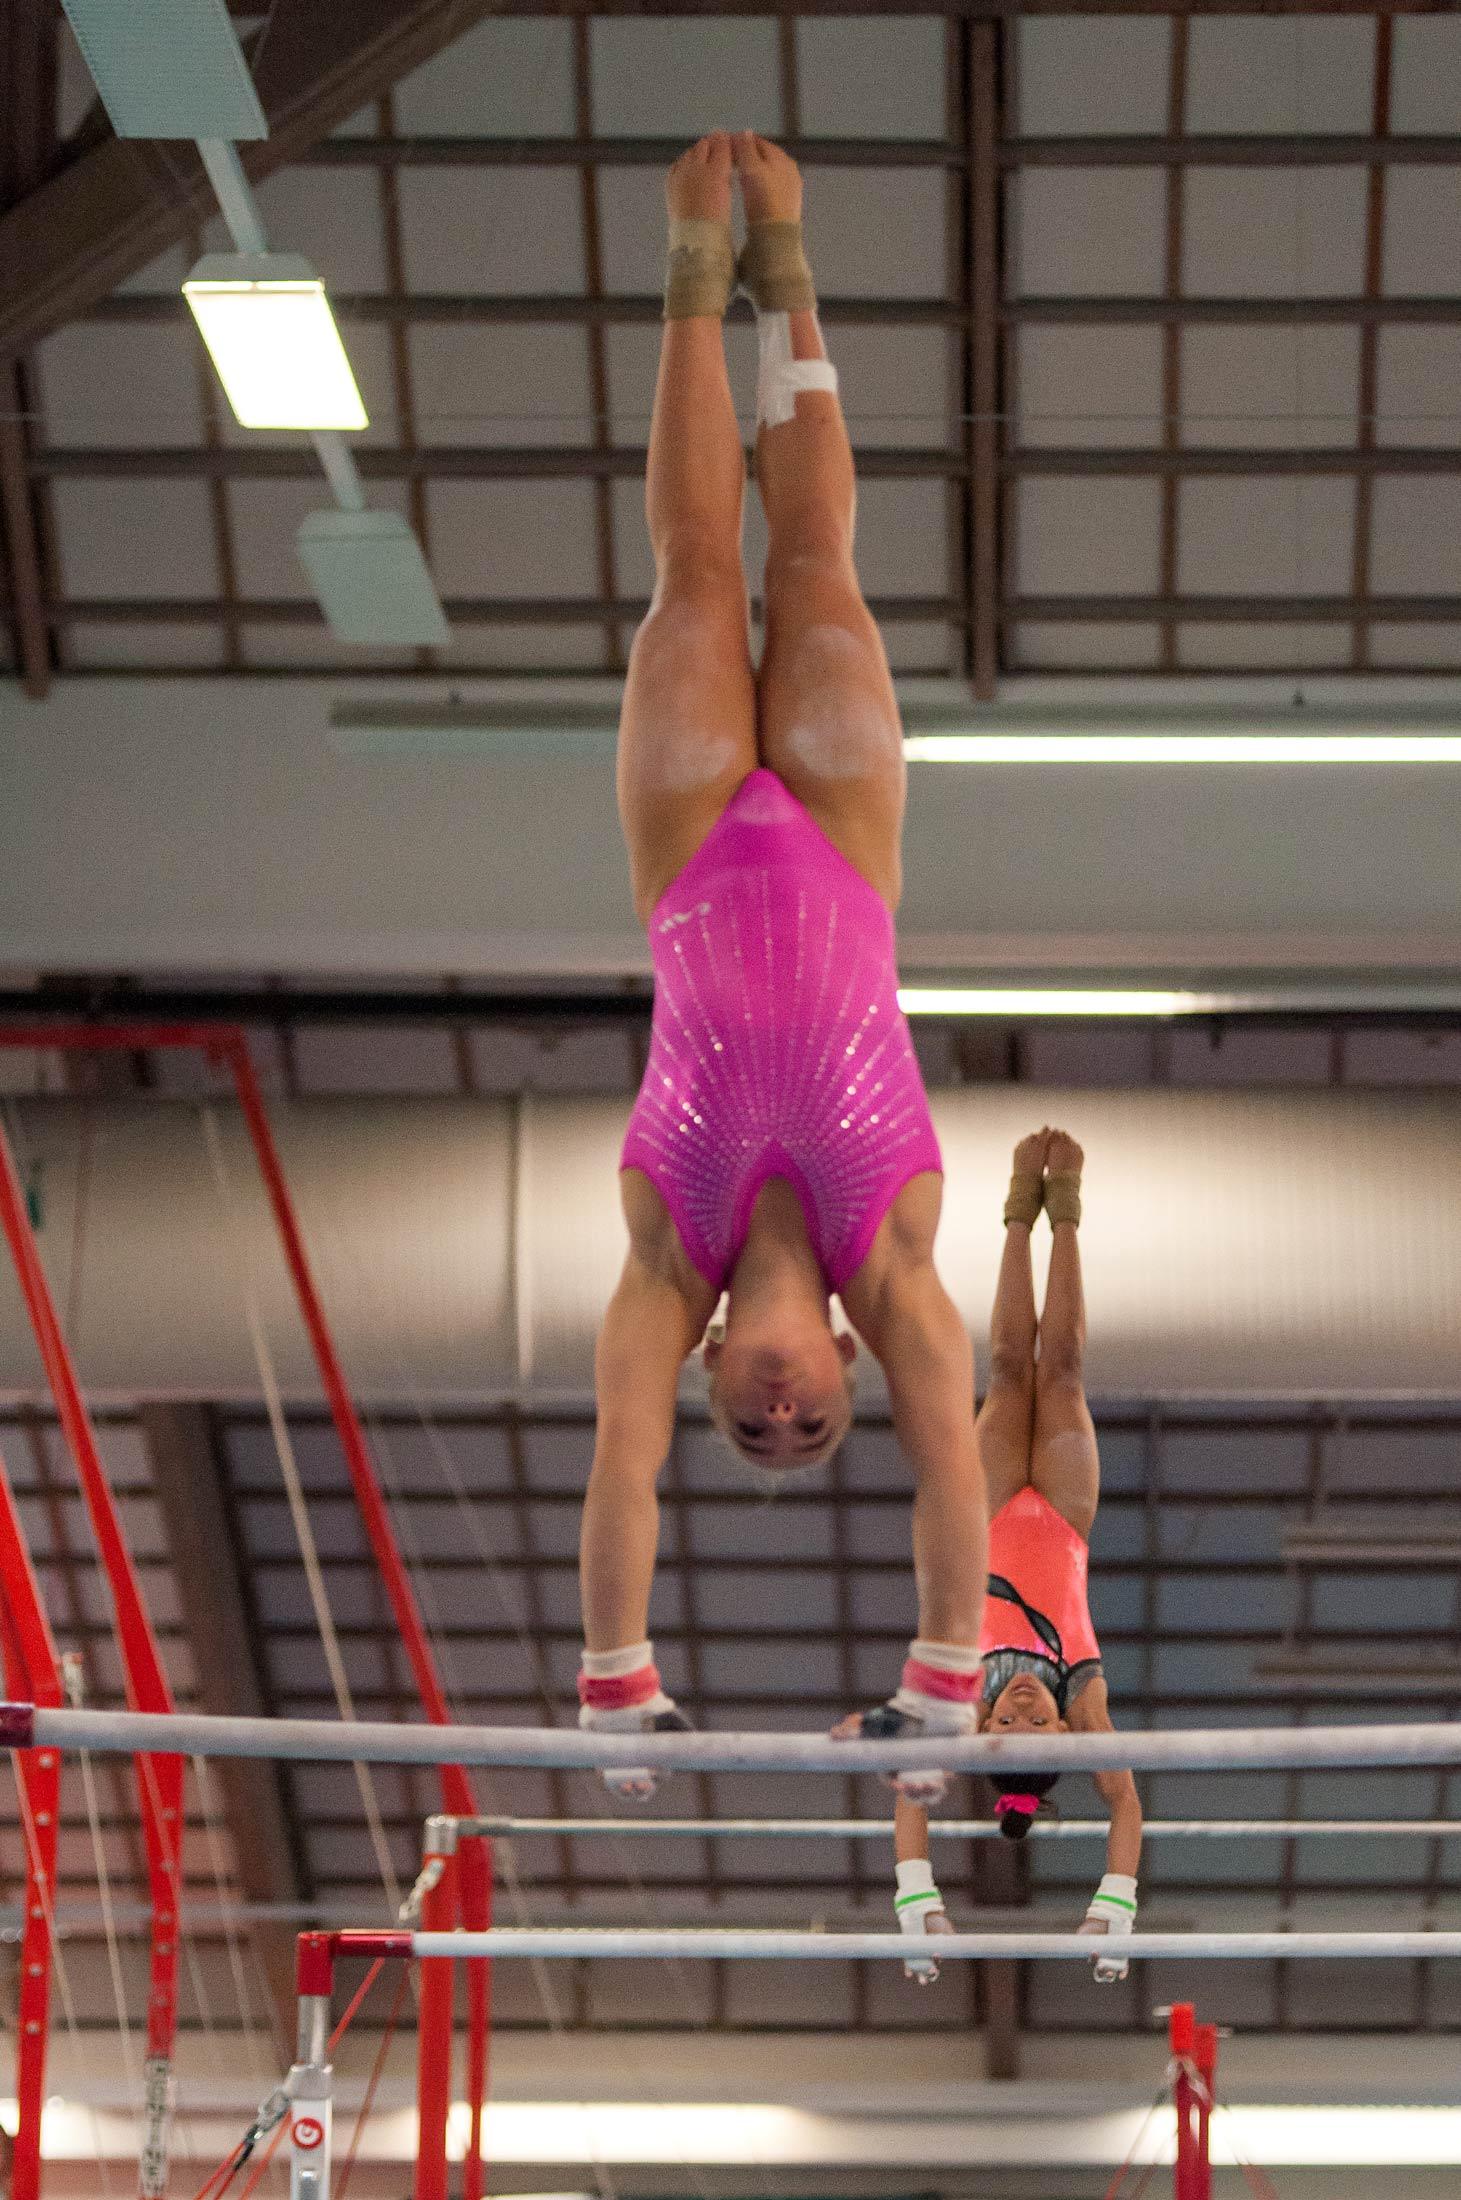 two gymnasts on high bars